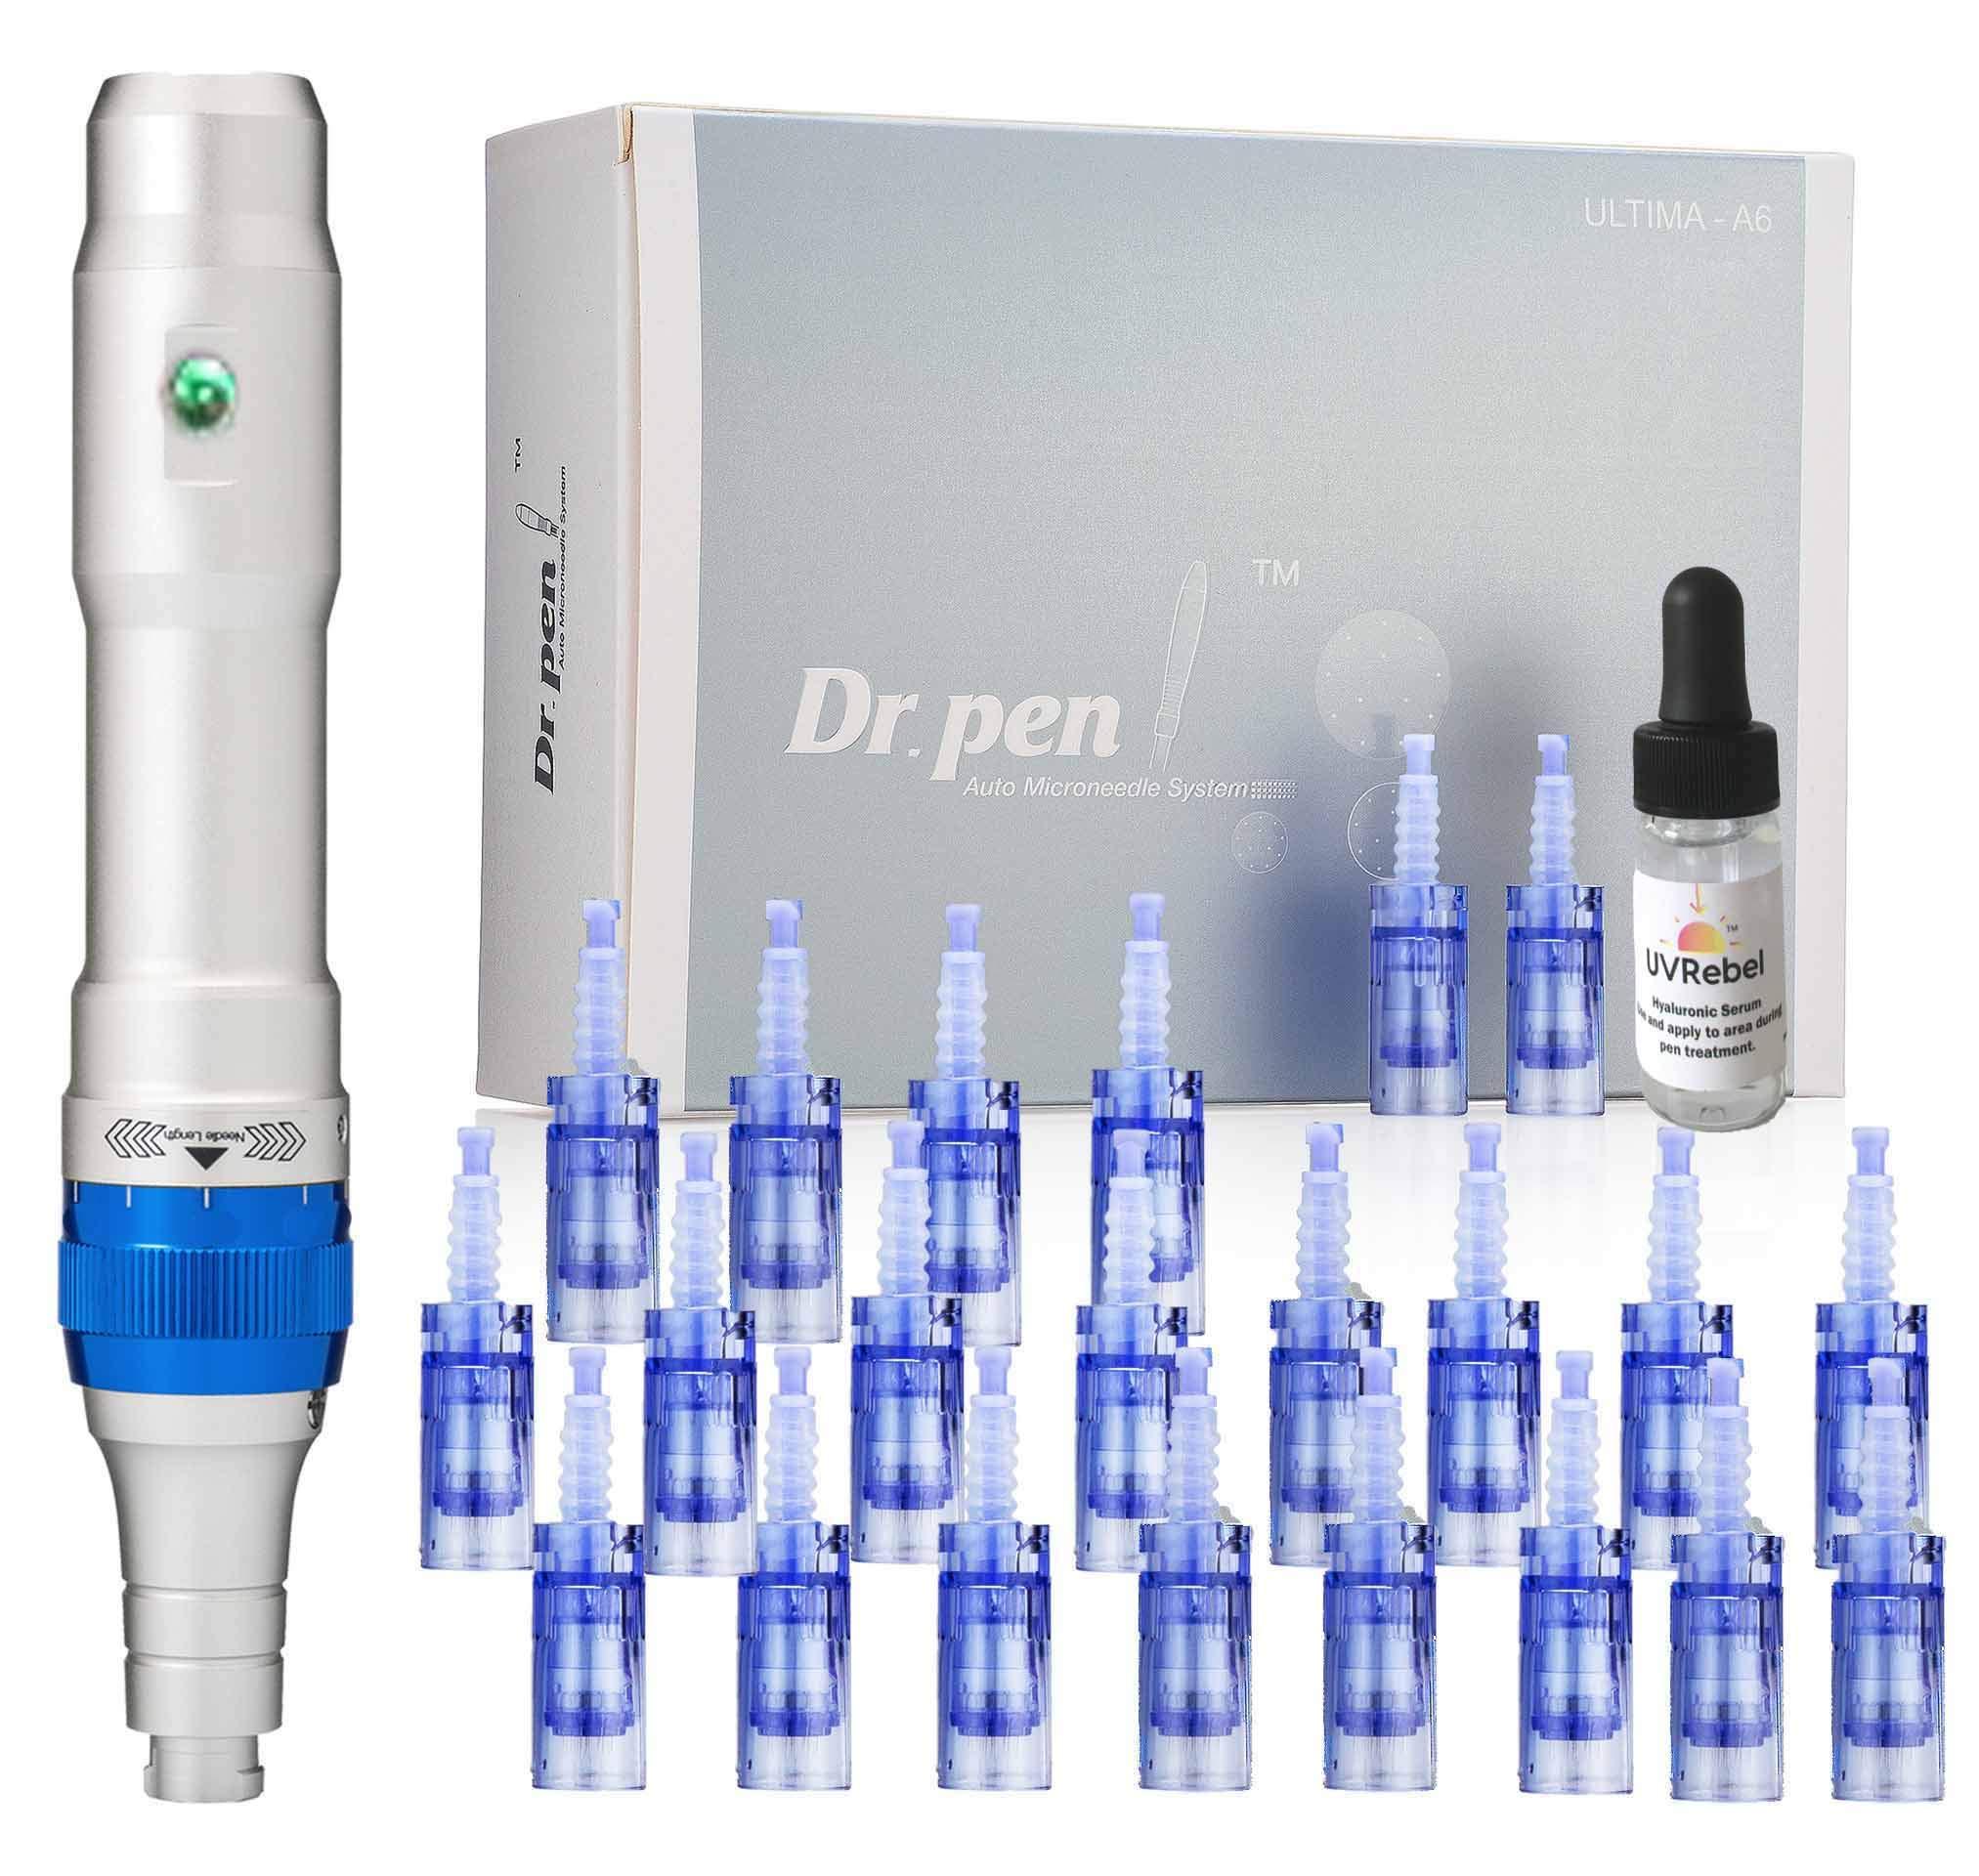 Dr. pen Ultima A6 Microneedling pen 24 Pcs Pin & Nano cartridges, 10 x 36-pin, 10 x Nano, 4 x 12-pin by Dr. Pen